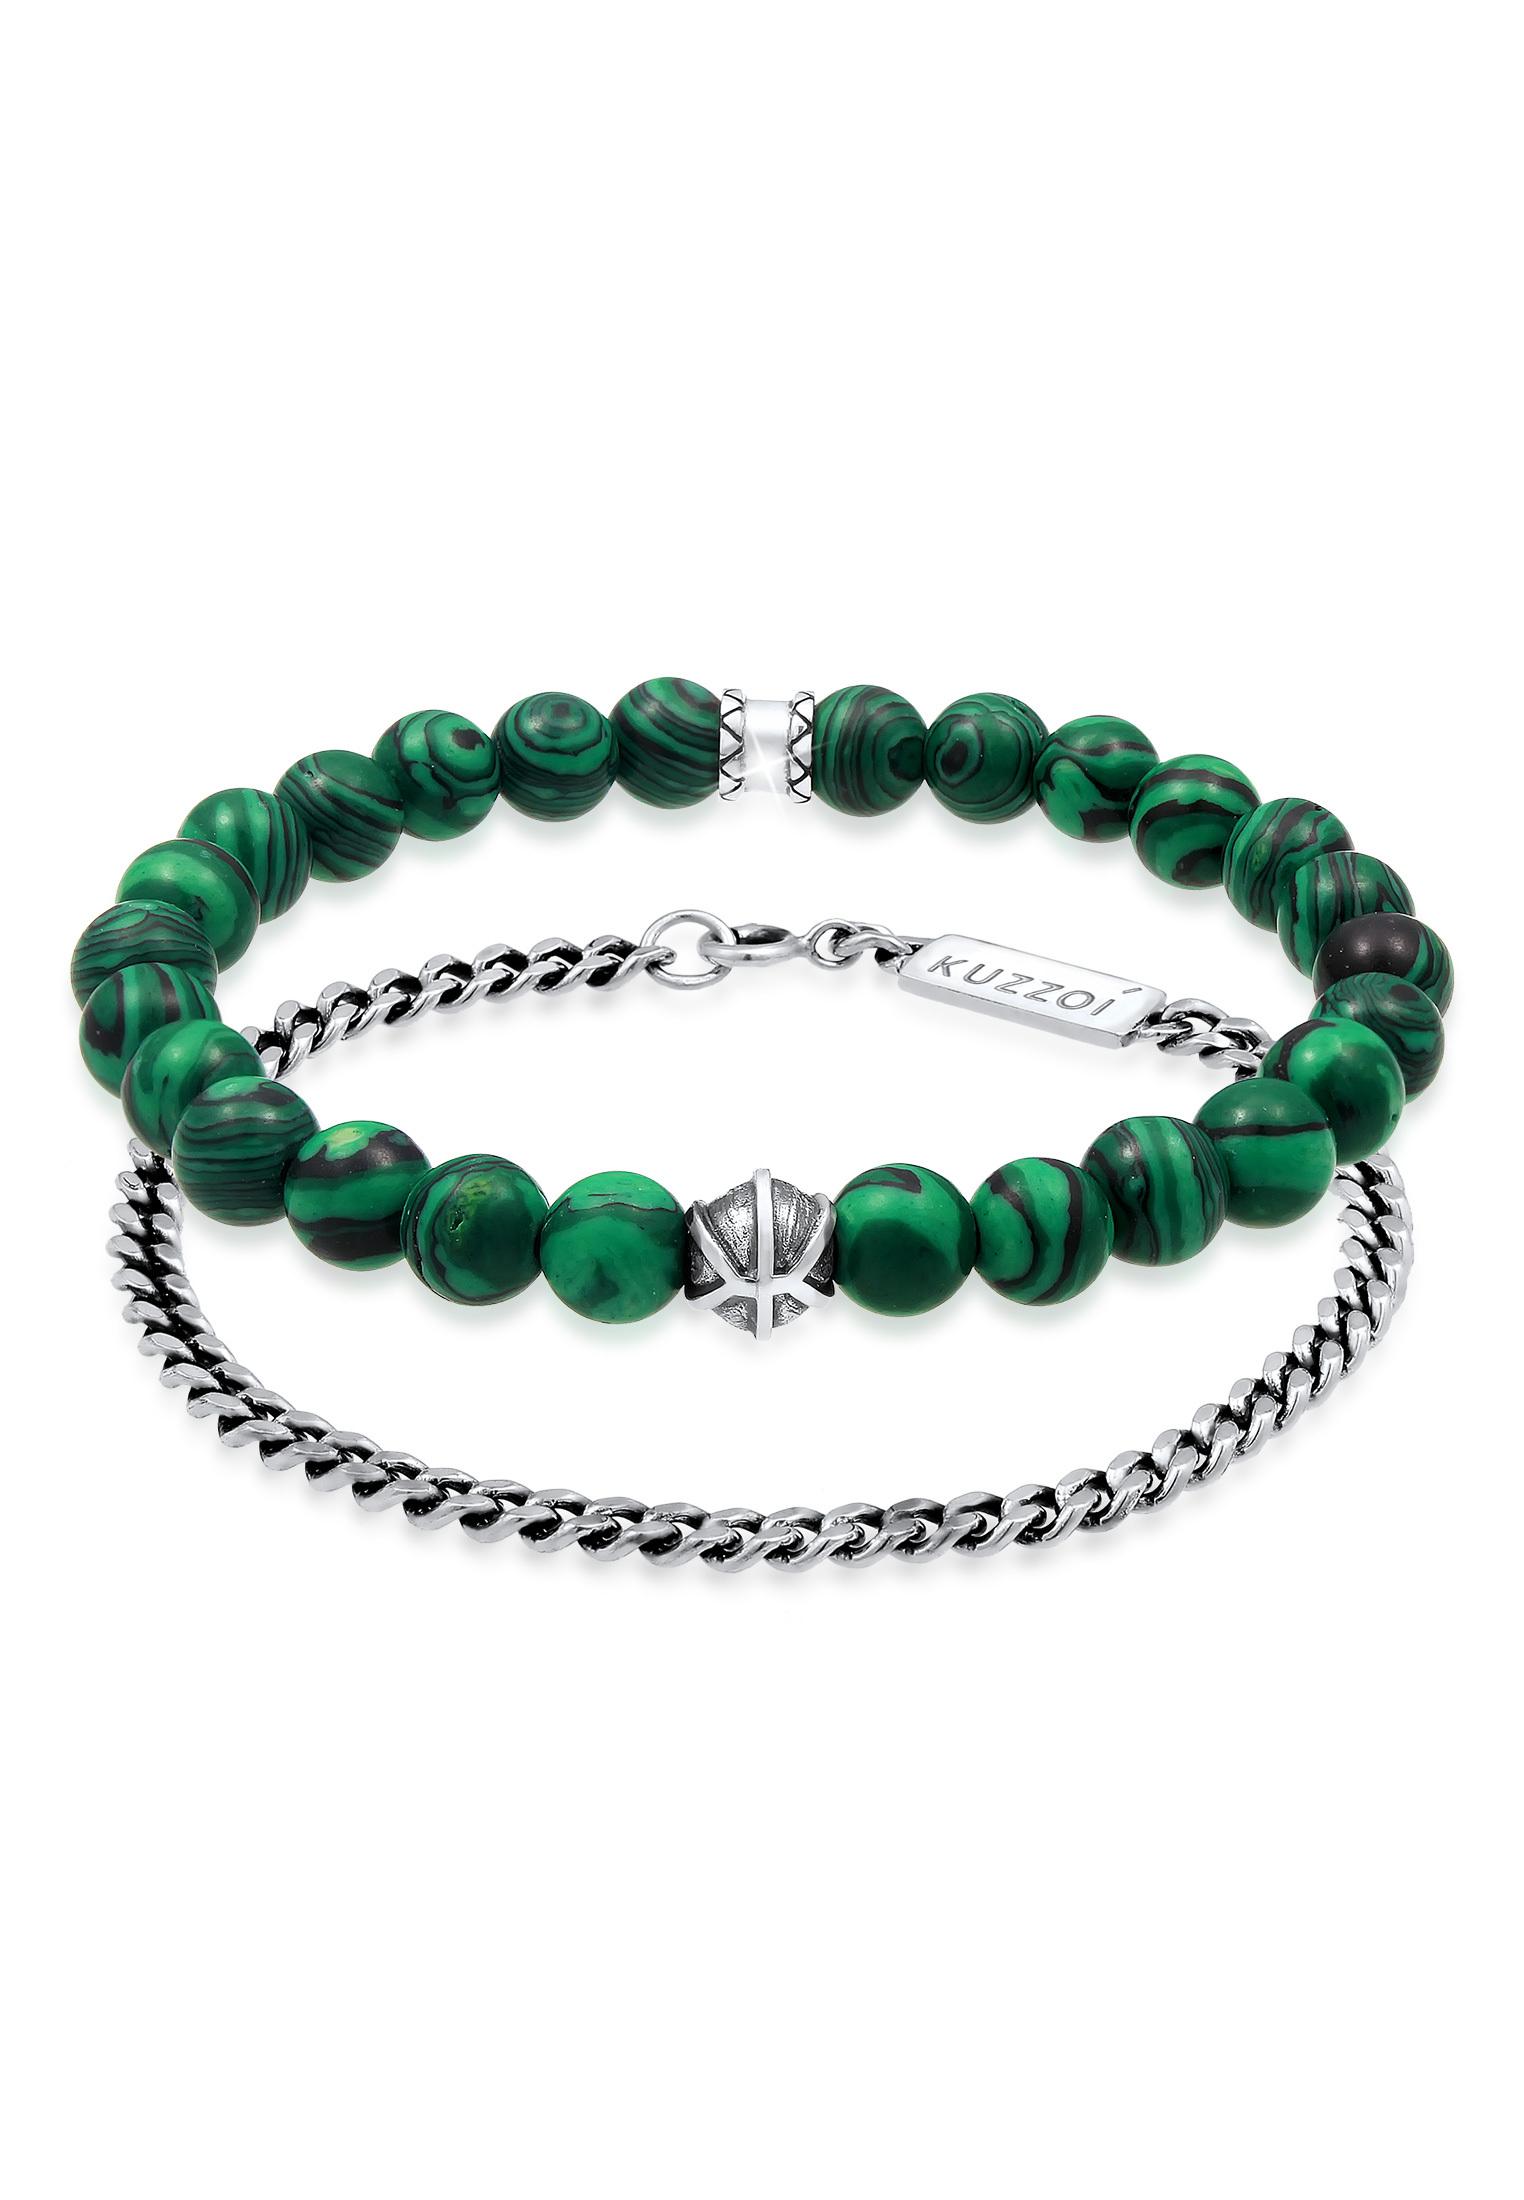 Armband   Achat ( Grün )   925er Sterling Silber